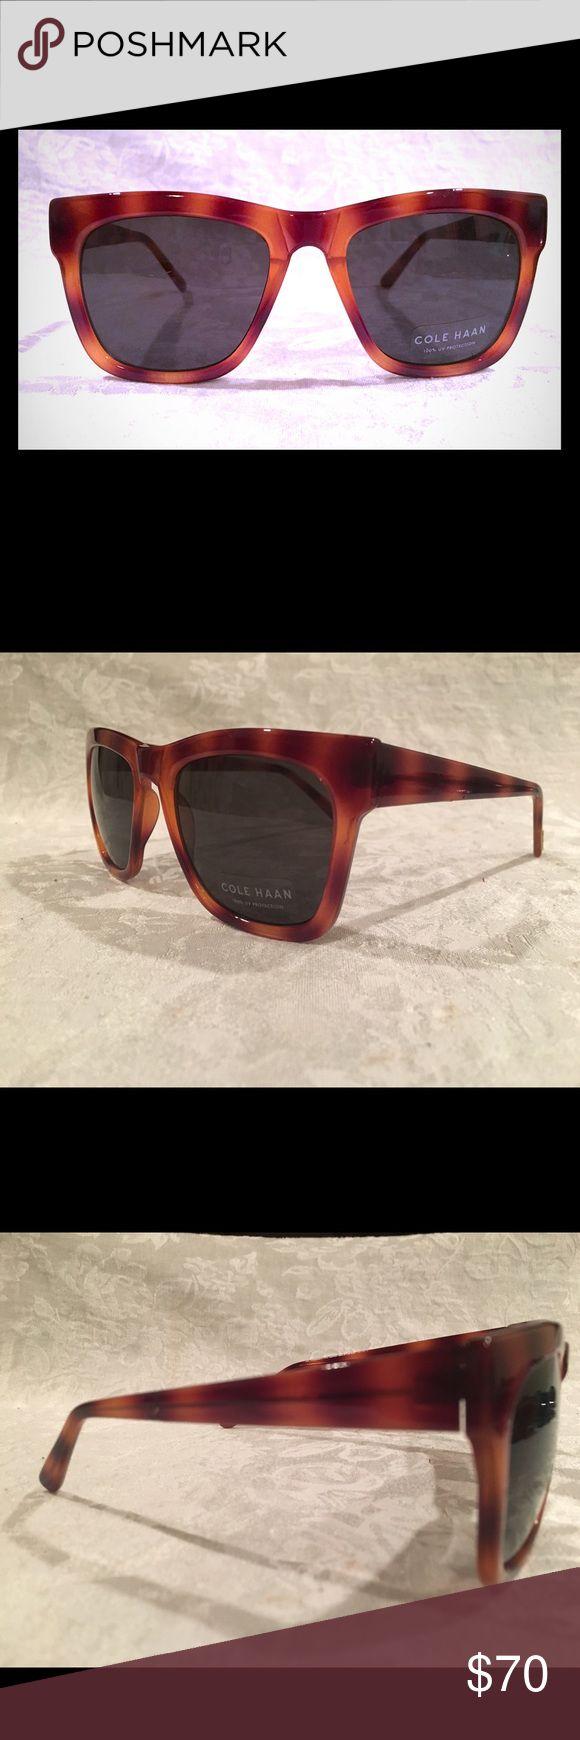 Cole Hakan women's sunglasses. NEW!!! Tortoiseshell body with dark lenses. Classic. NEW!! Cole Haan Accessories Sunglasses